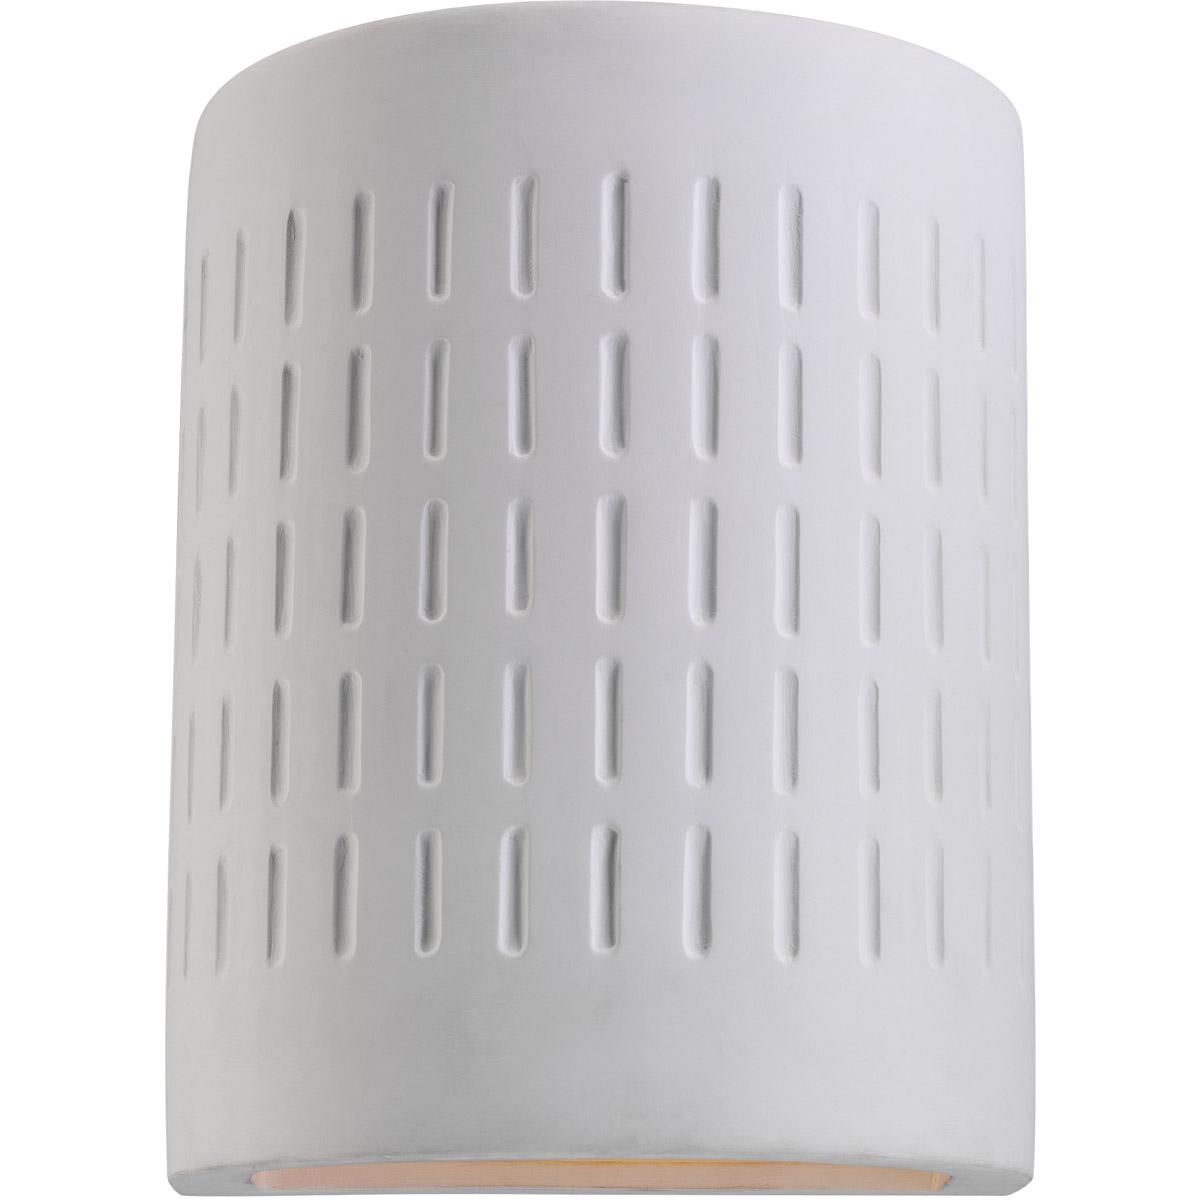 Sea Gull Lighting Paintable Ceramic Sconces 1 Light Outdoor Wall Lantern in Unfinish Ceramic 83046-714 photo